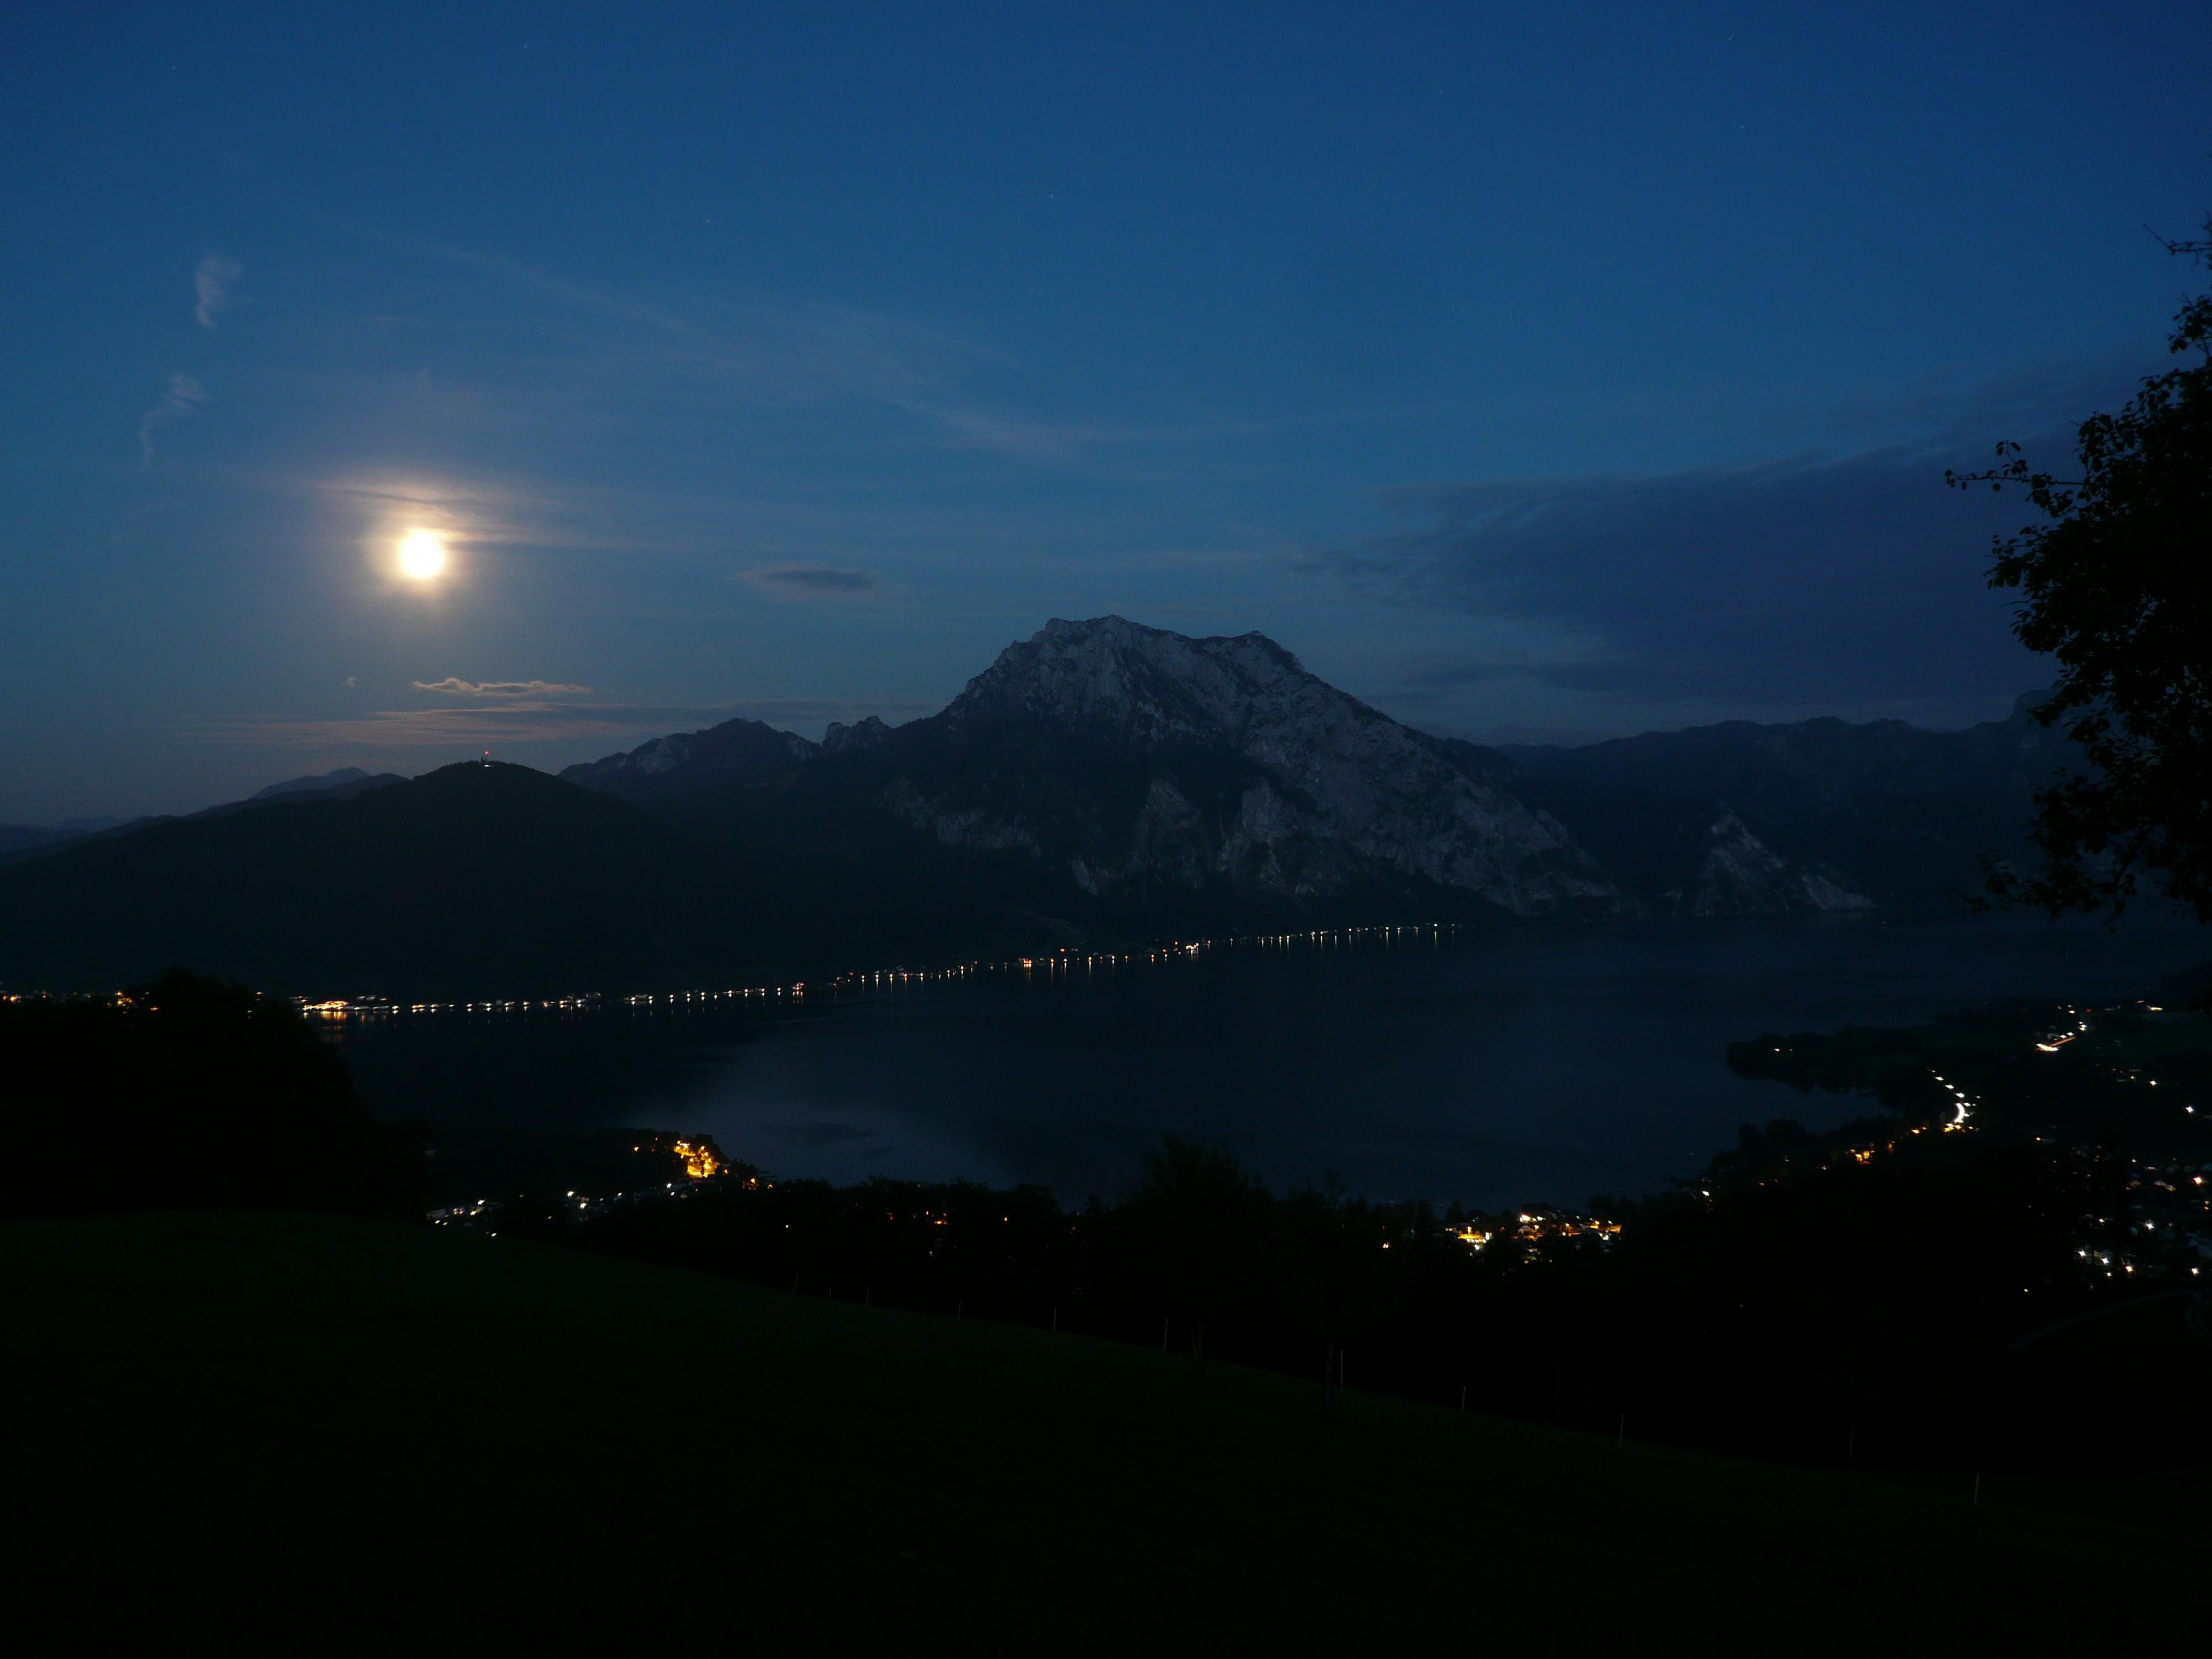 Mountain lake at night 1 by HolzOnkel on DeviantArt